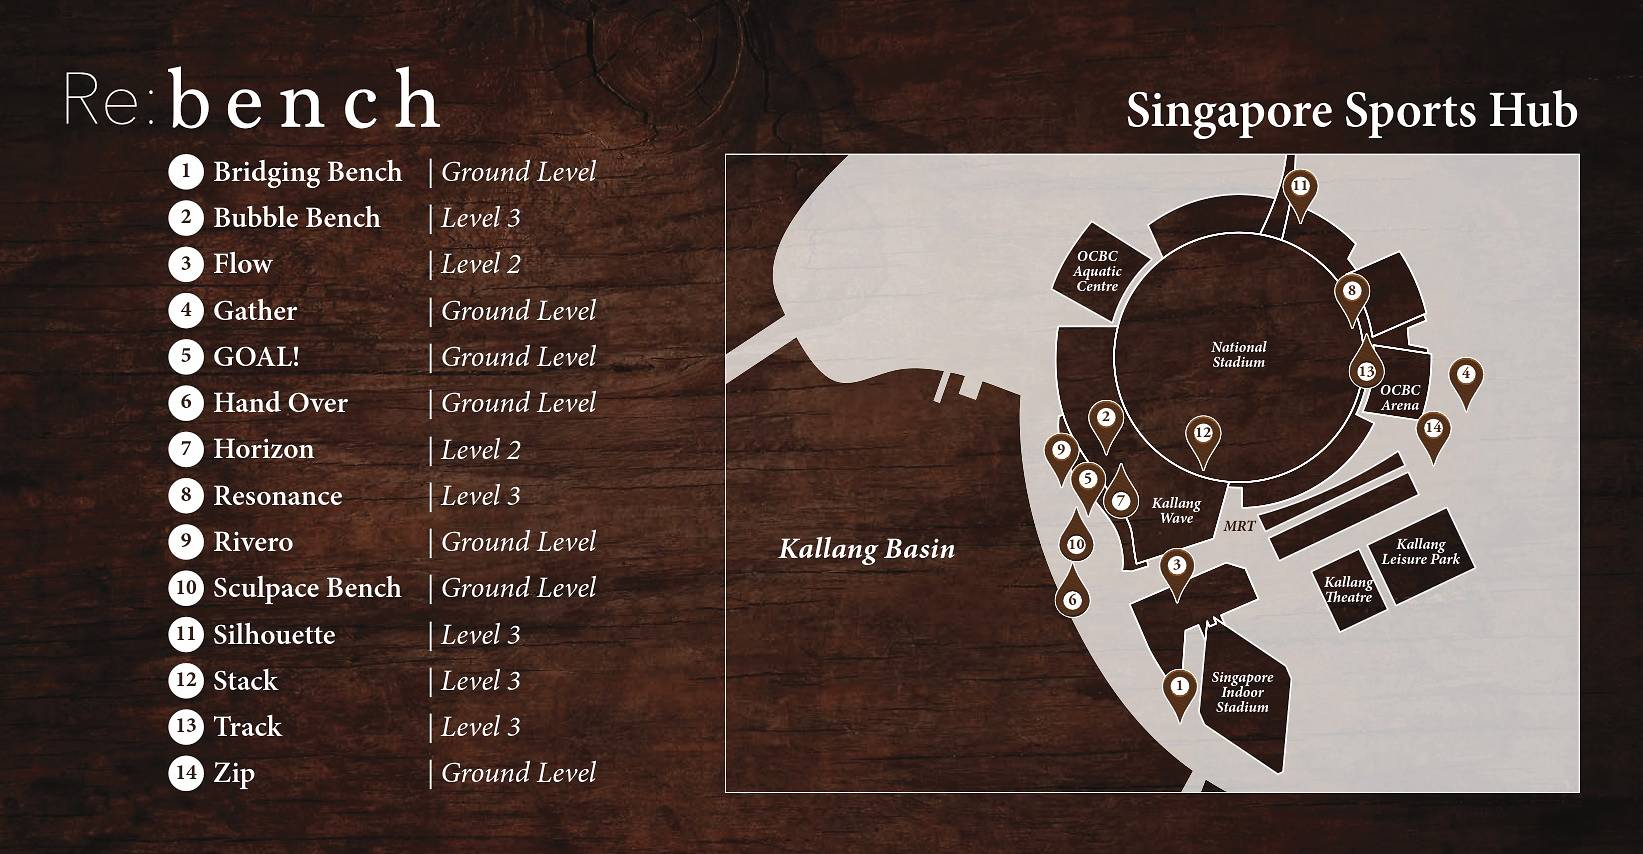 singapore-sports-hub-bench-map cna.jpg